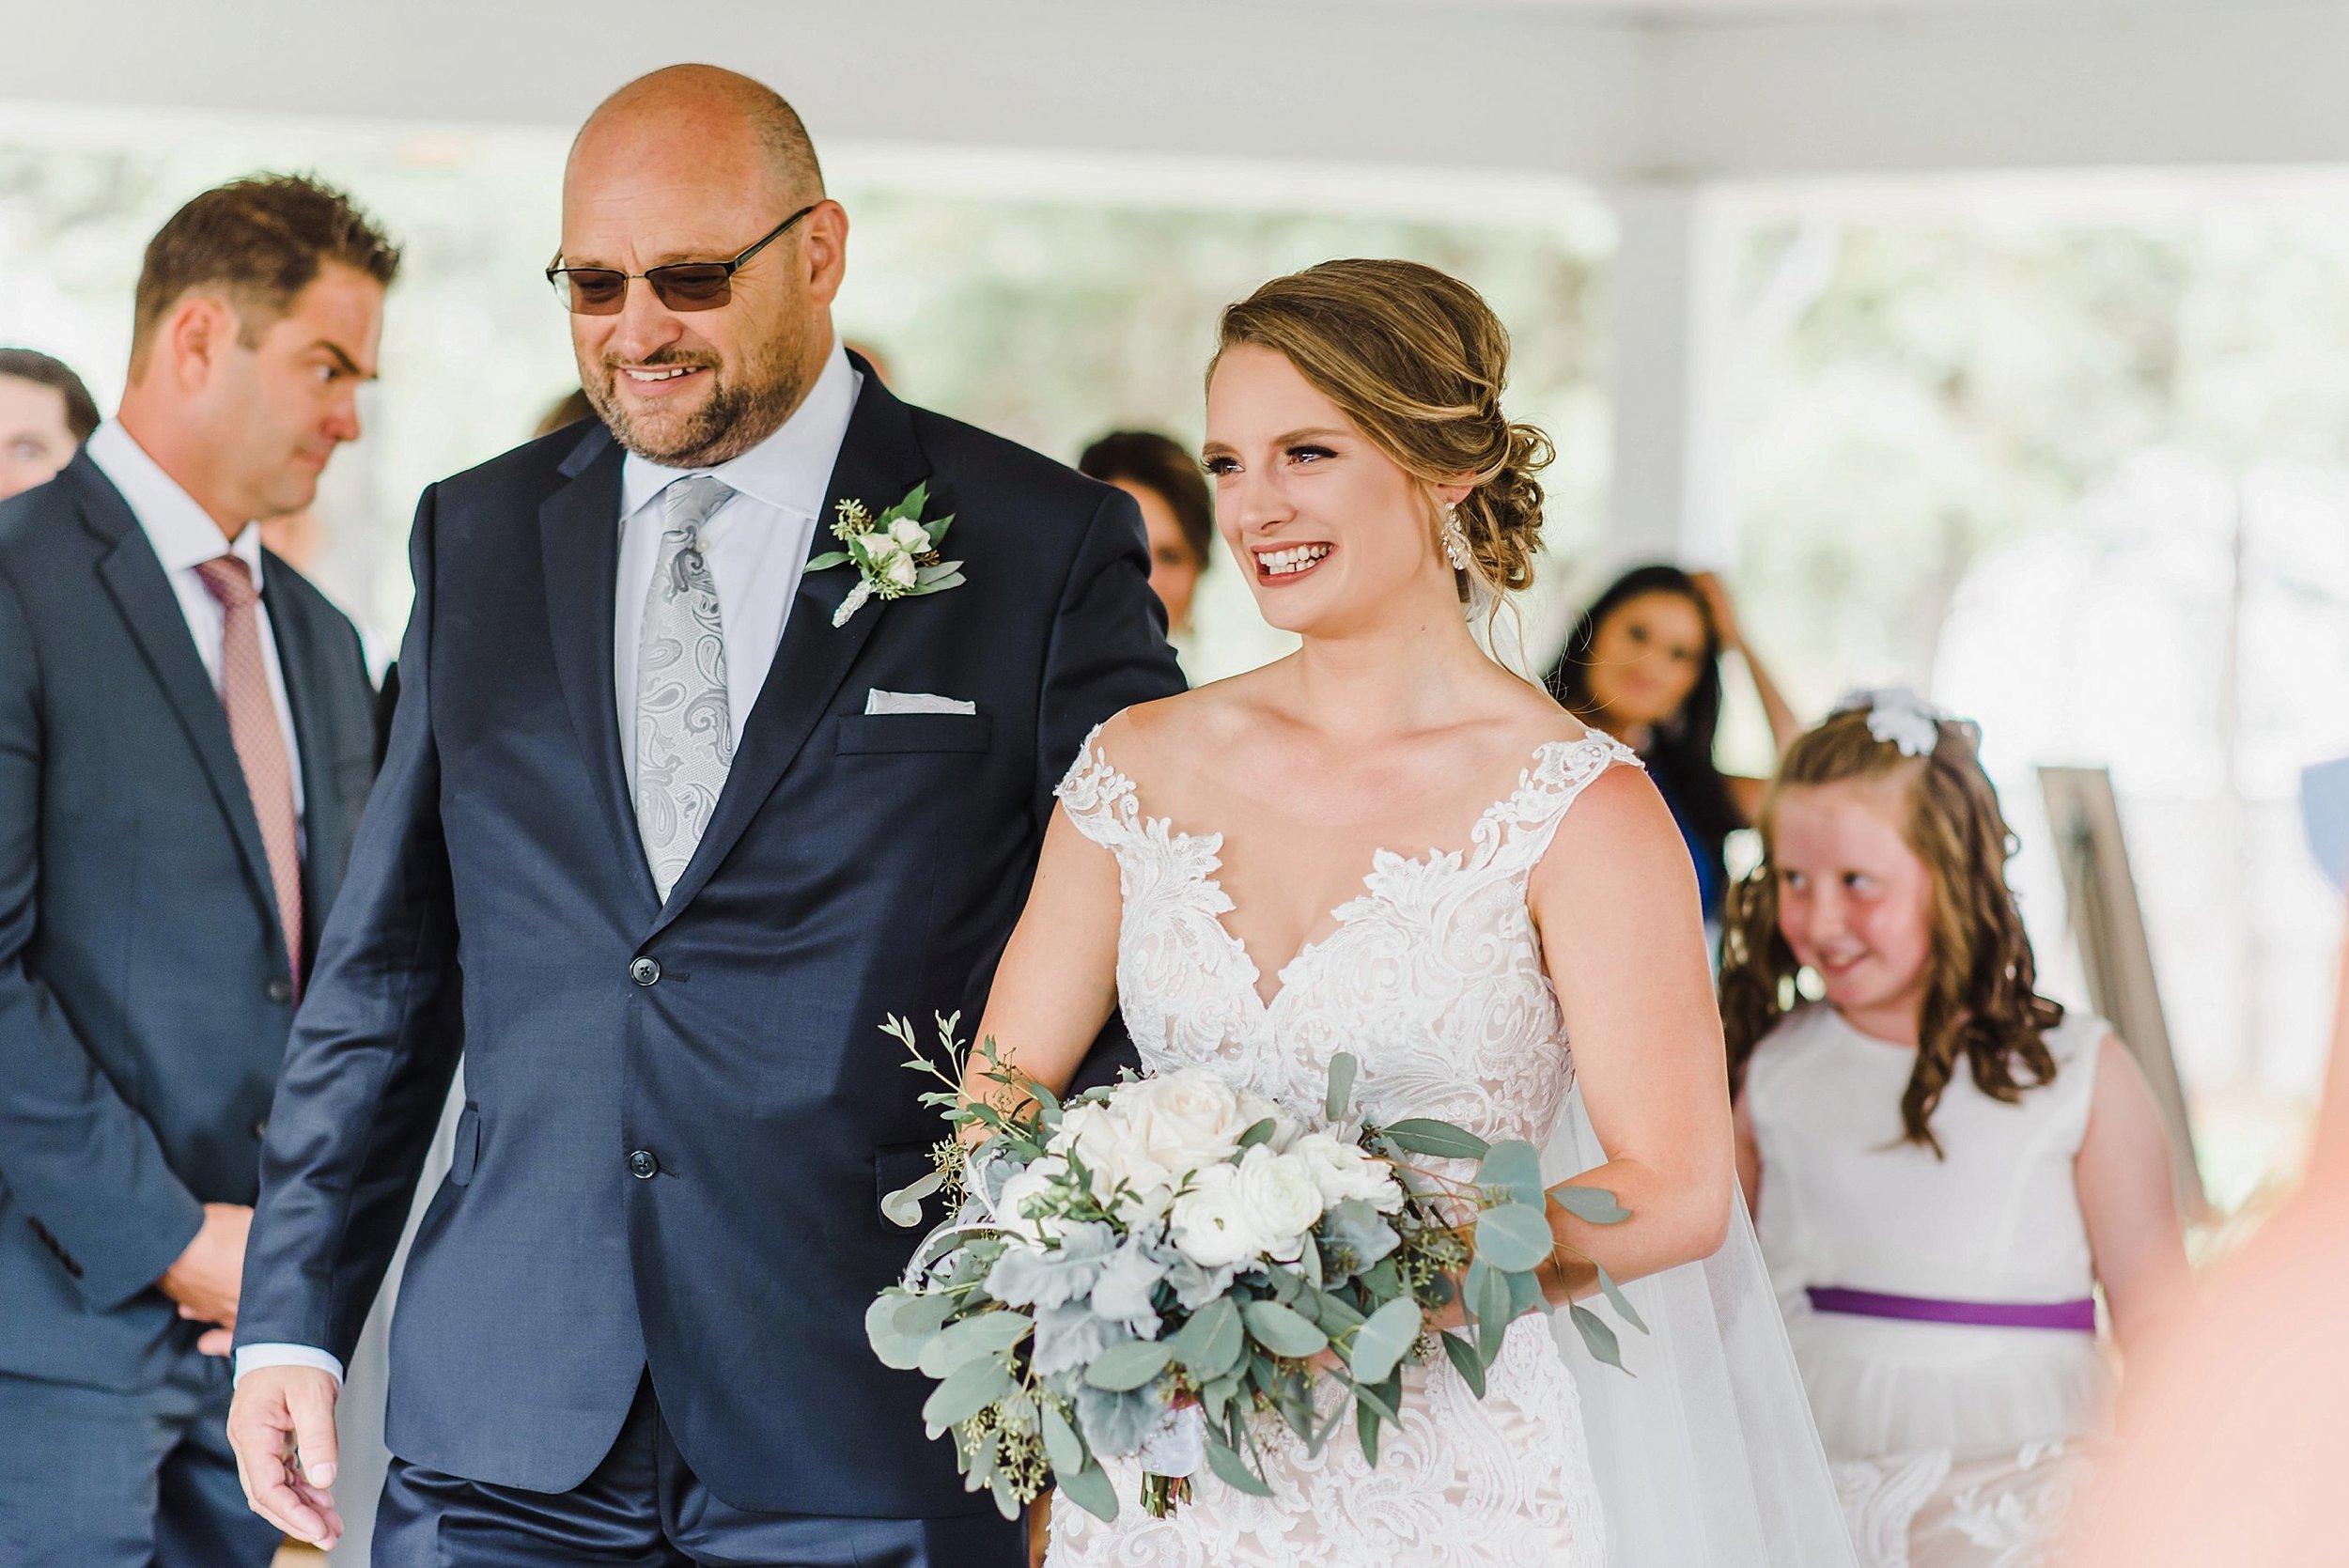 light airy indie fine art ottawa wedding photographer | Ali and Batoul Photography_1267.jpg